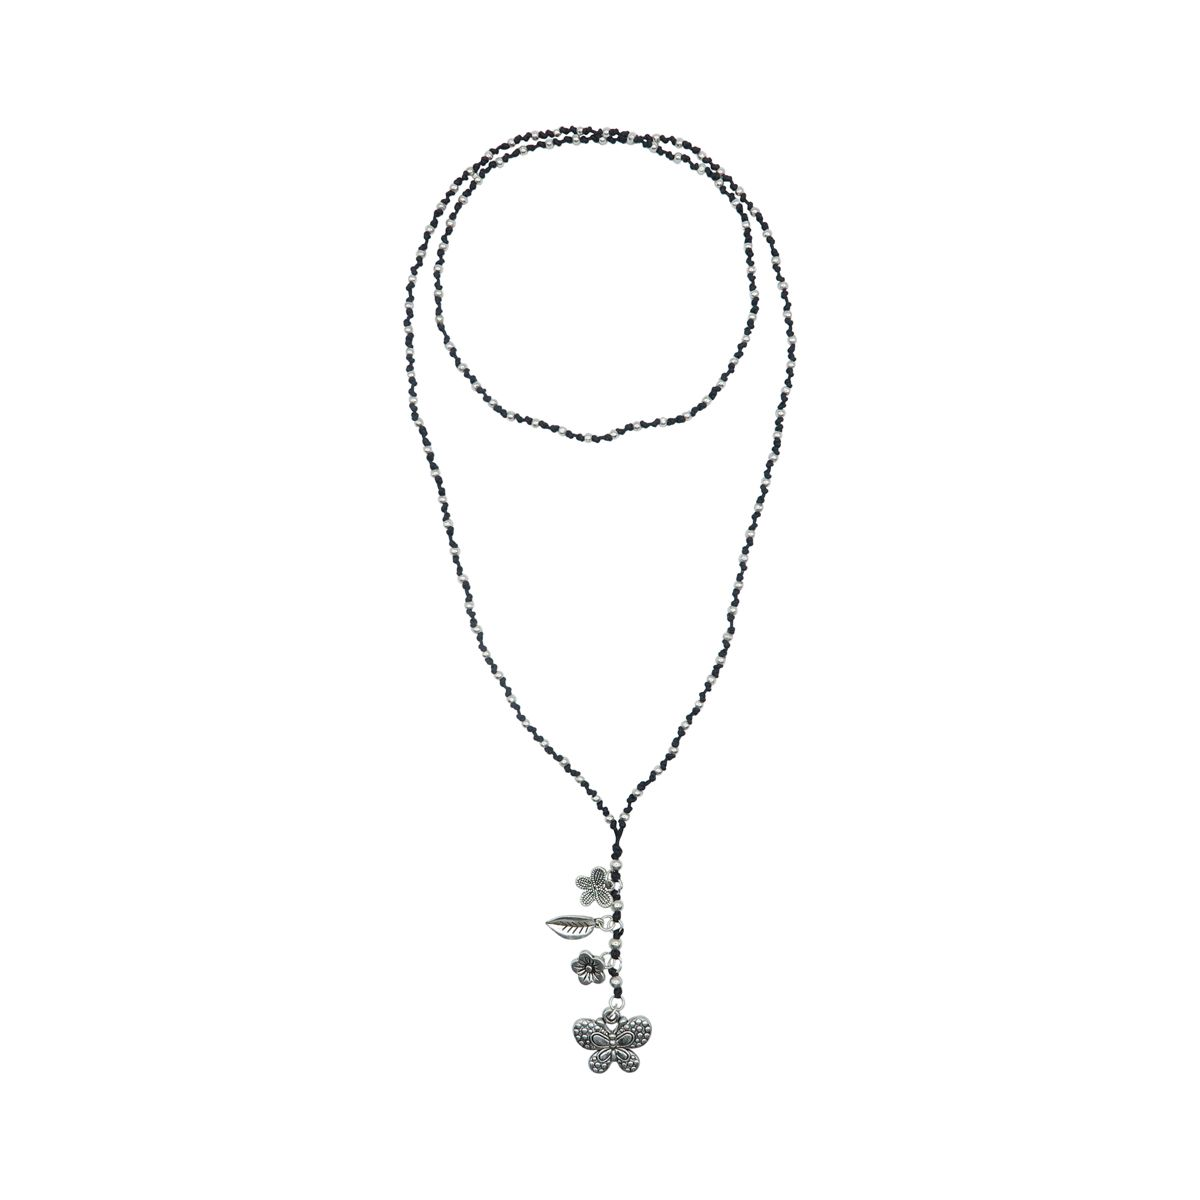 BOHO Pendant Necklace